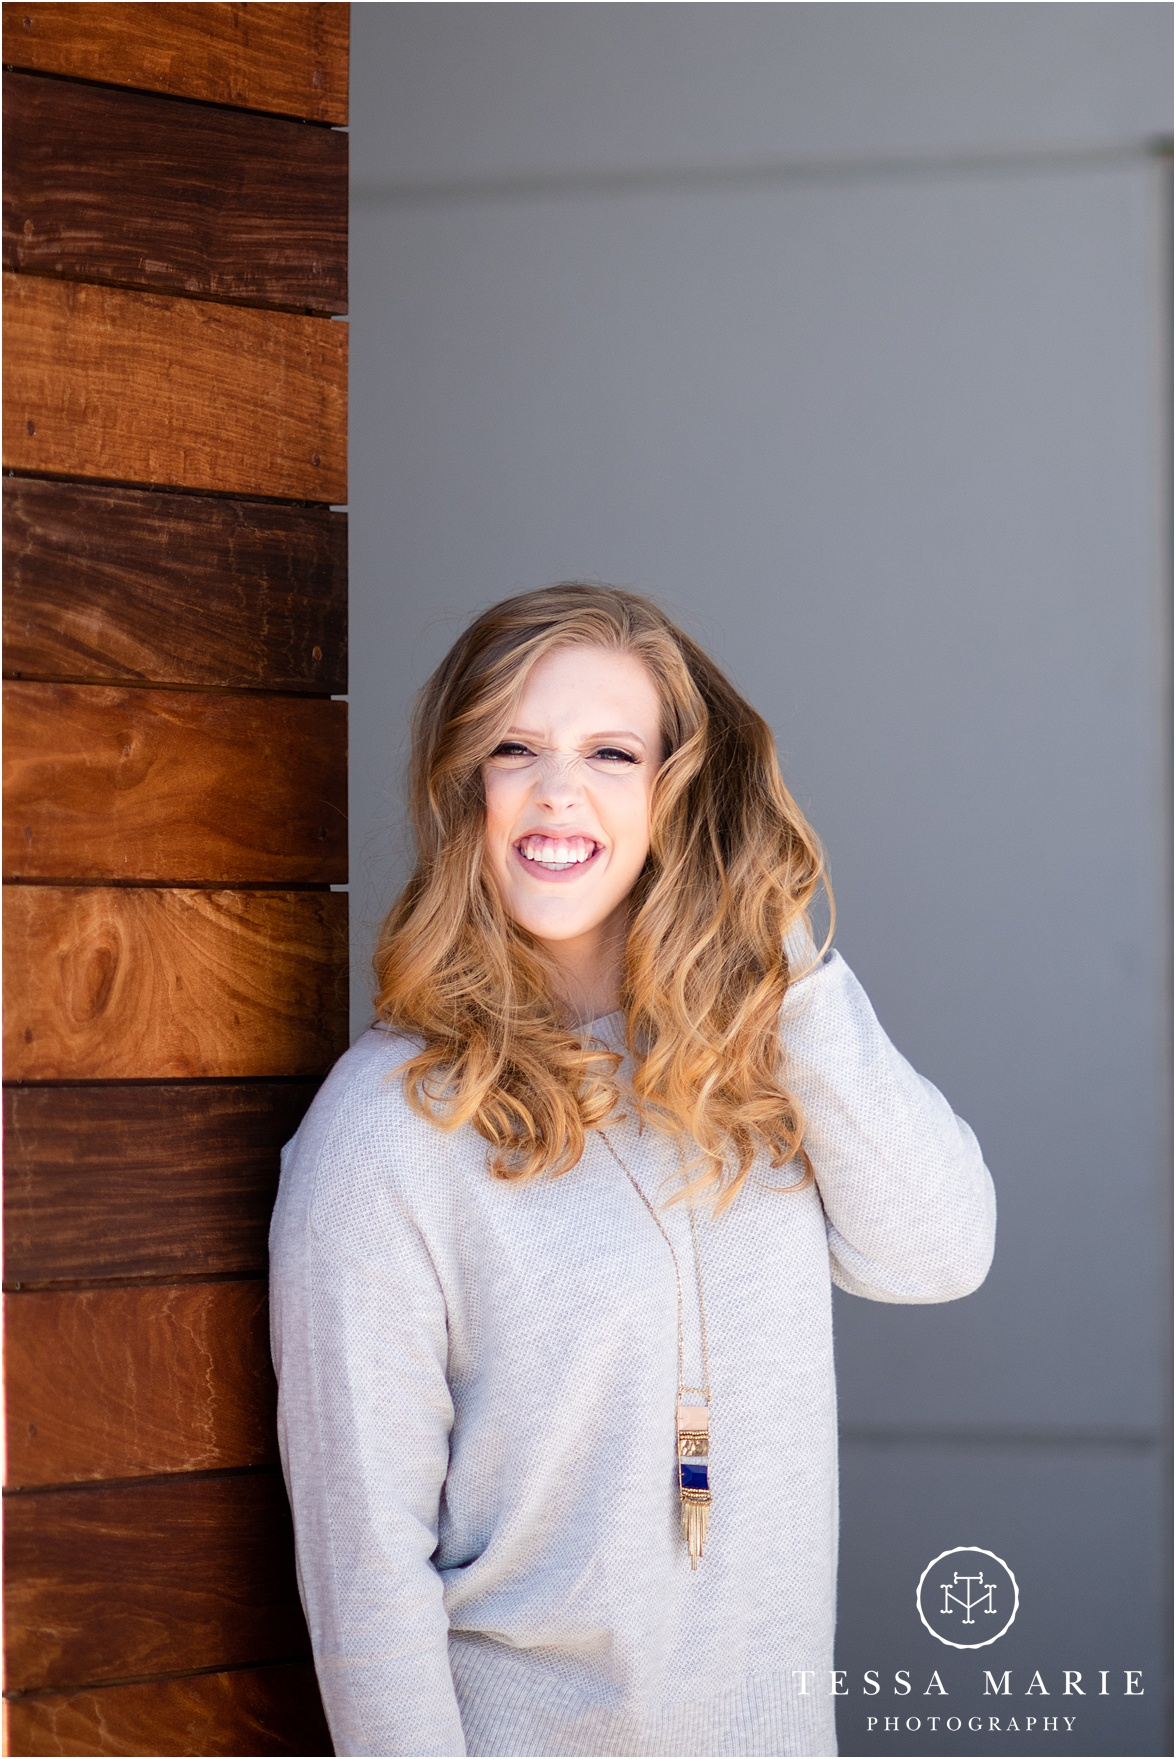 Atlanta_senior_photography_teen_girl_portraits_tessa_marie_studios_the_experience_0001.jpg